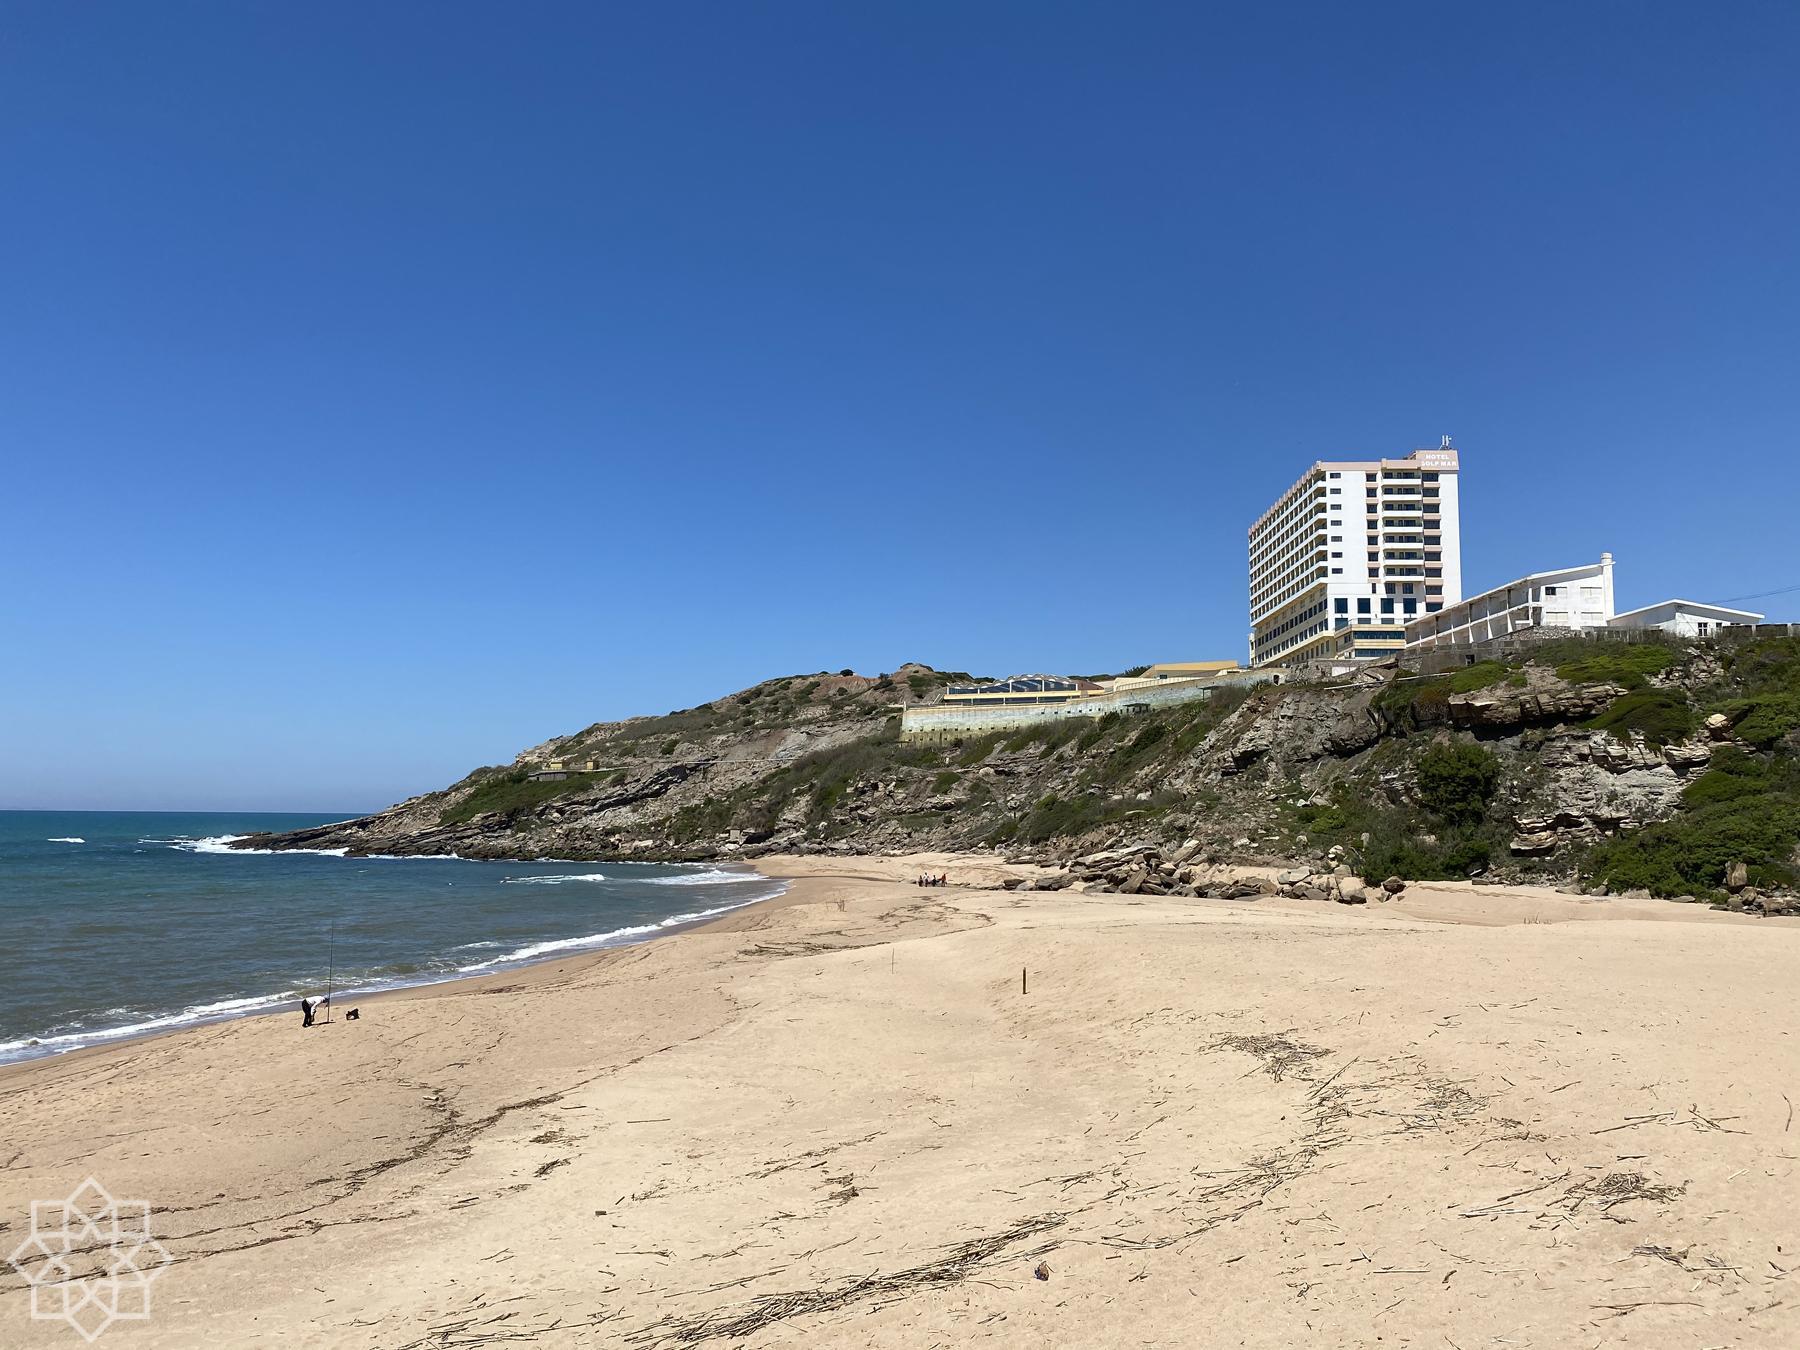 Hotel Golf Mar en bit norrut från Santa Cruz